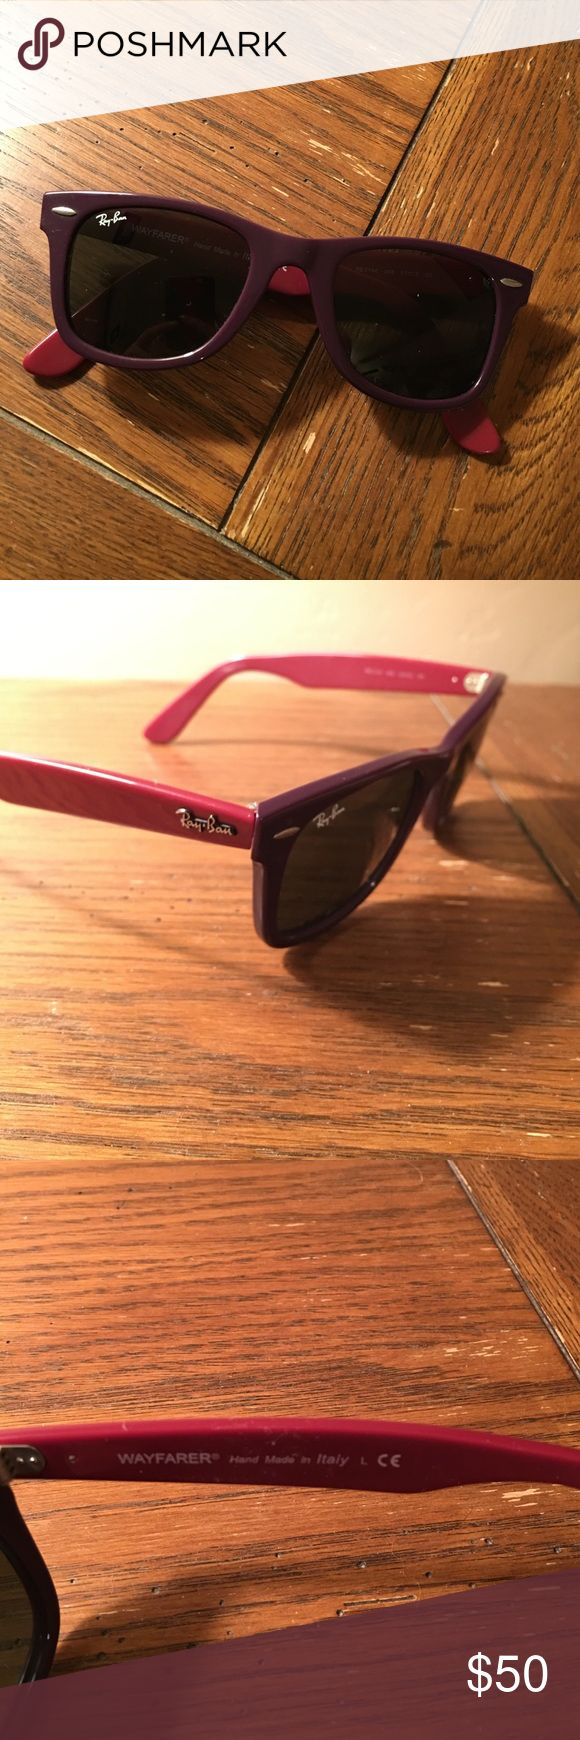 RayBan Wayfarers Limited edition purple & magenta authentic RayBan Wayfarer sunglasses. Good condition. Barely worn. Ray-Ban Accessories Sunglasses